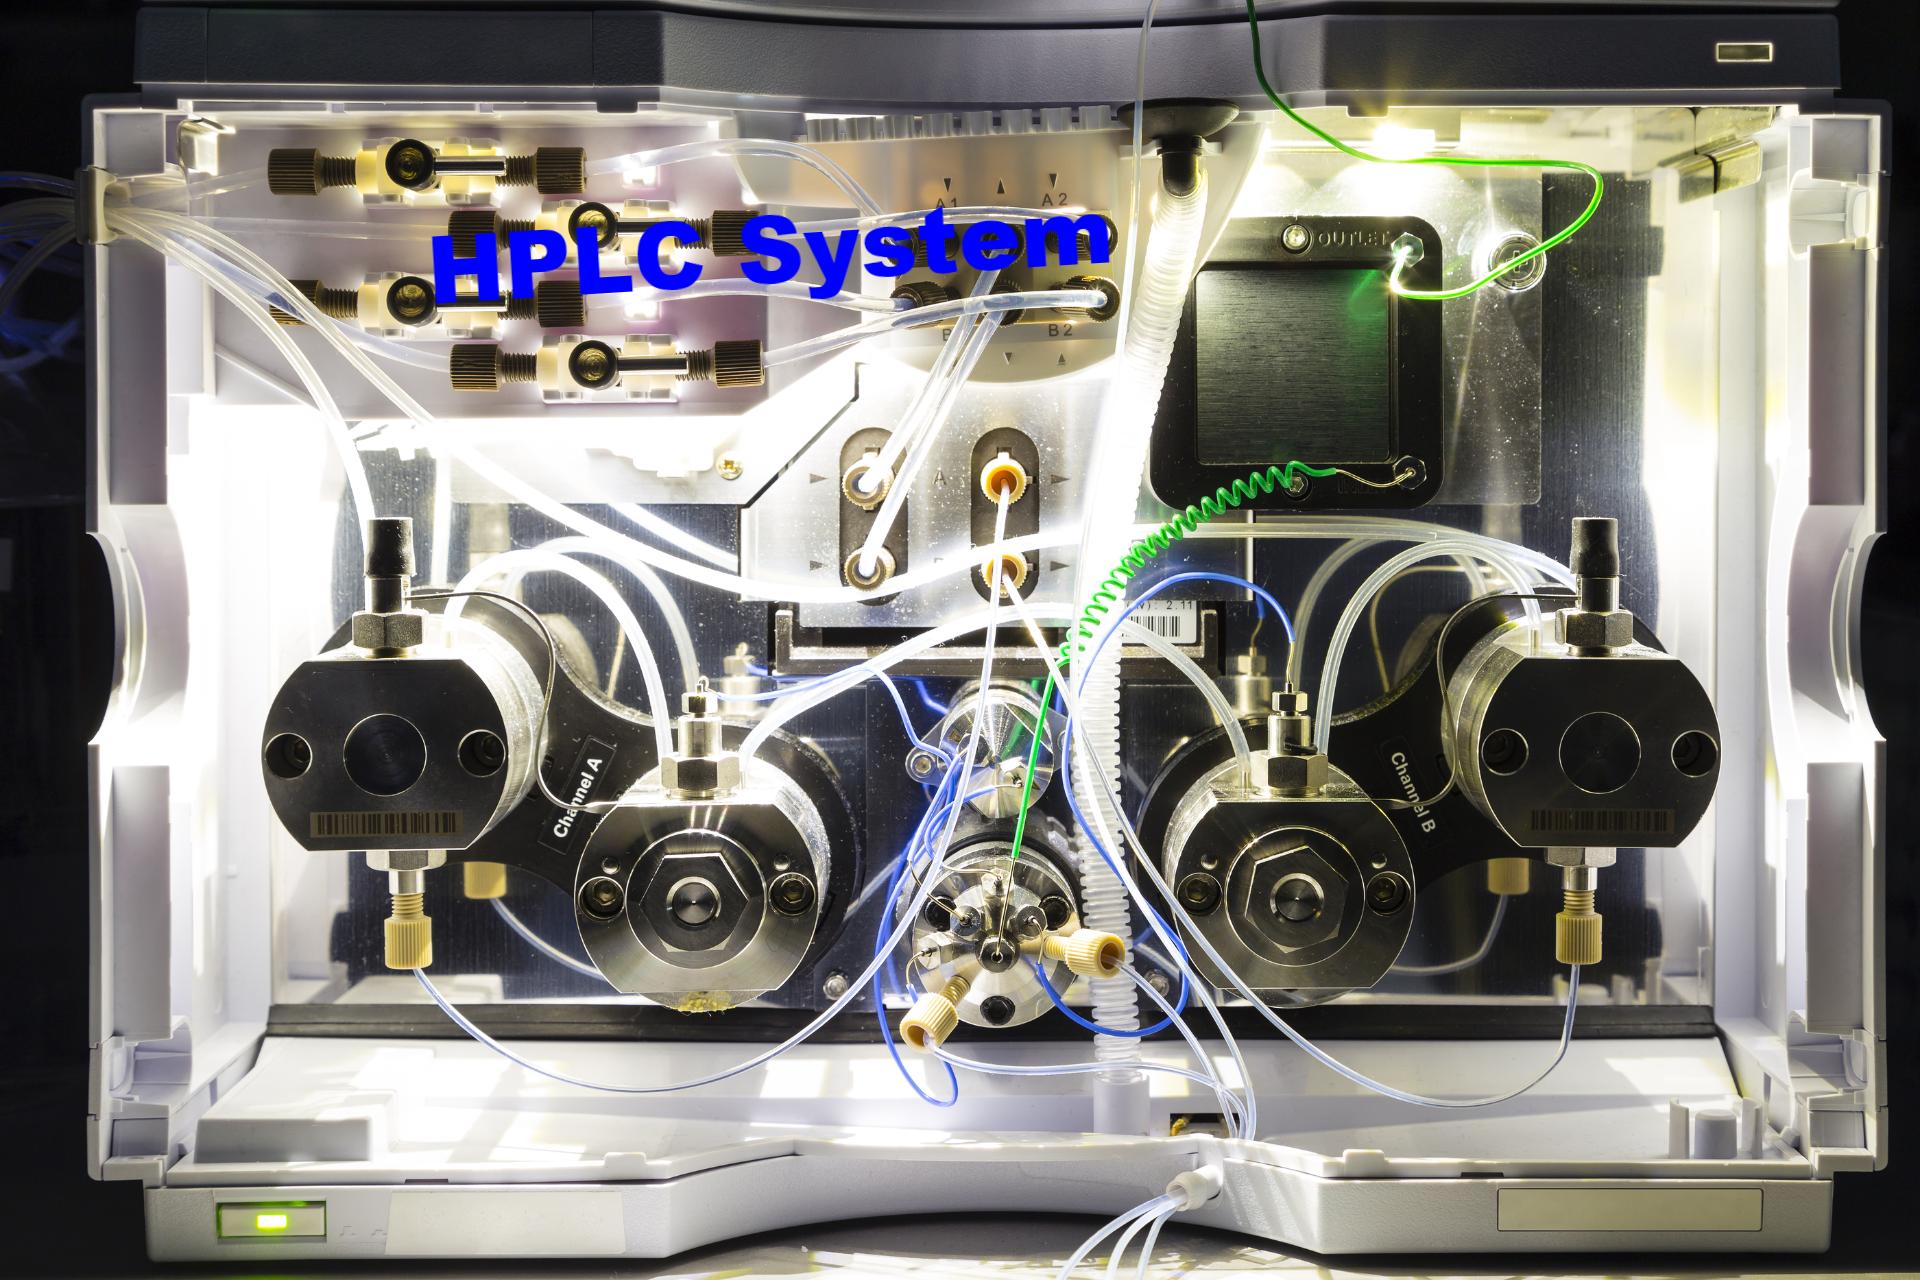 Hplc System_edited.jpg